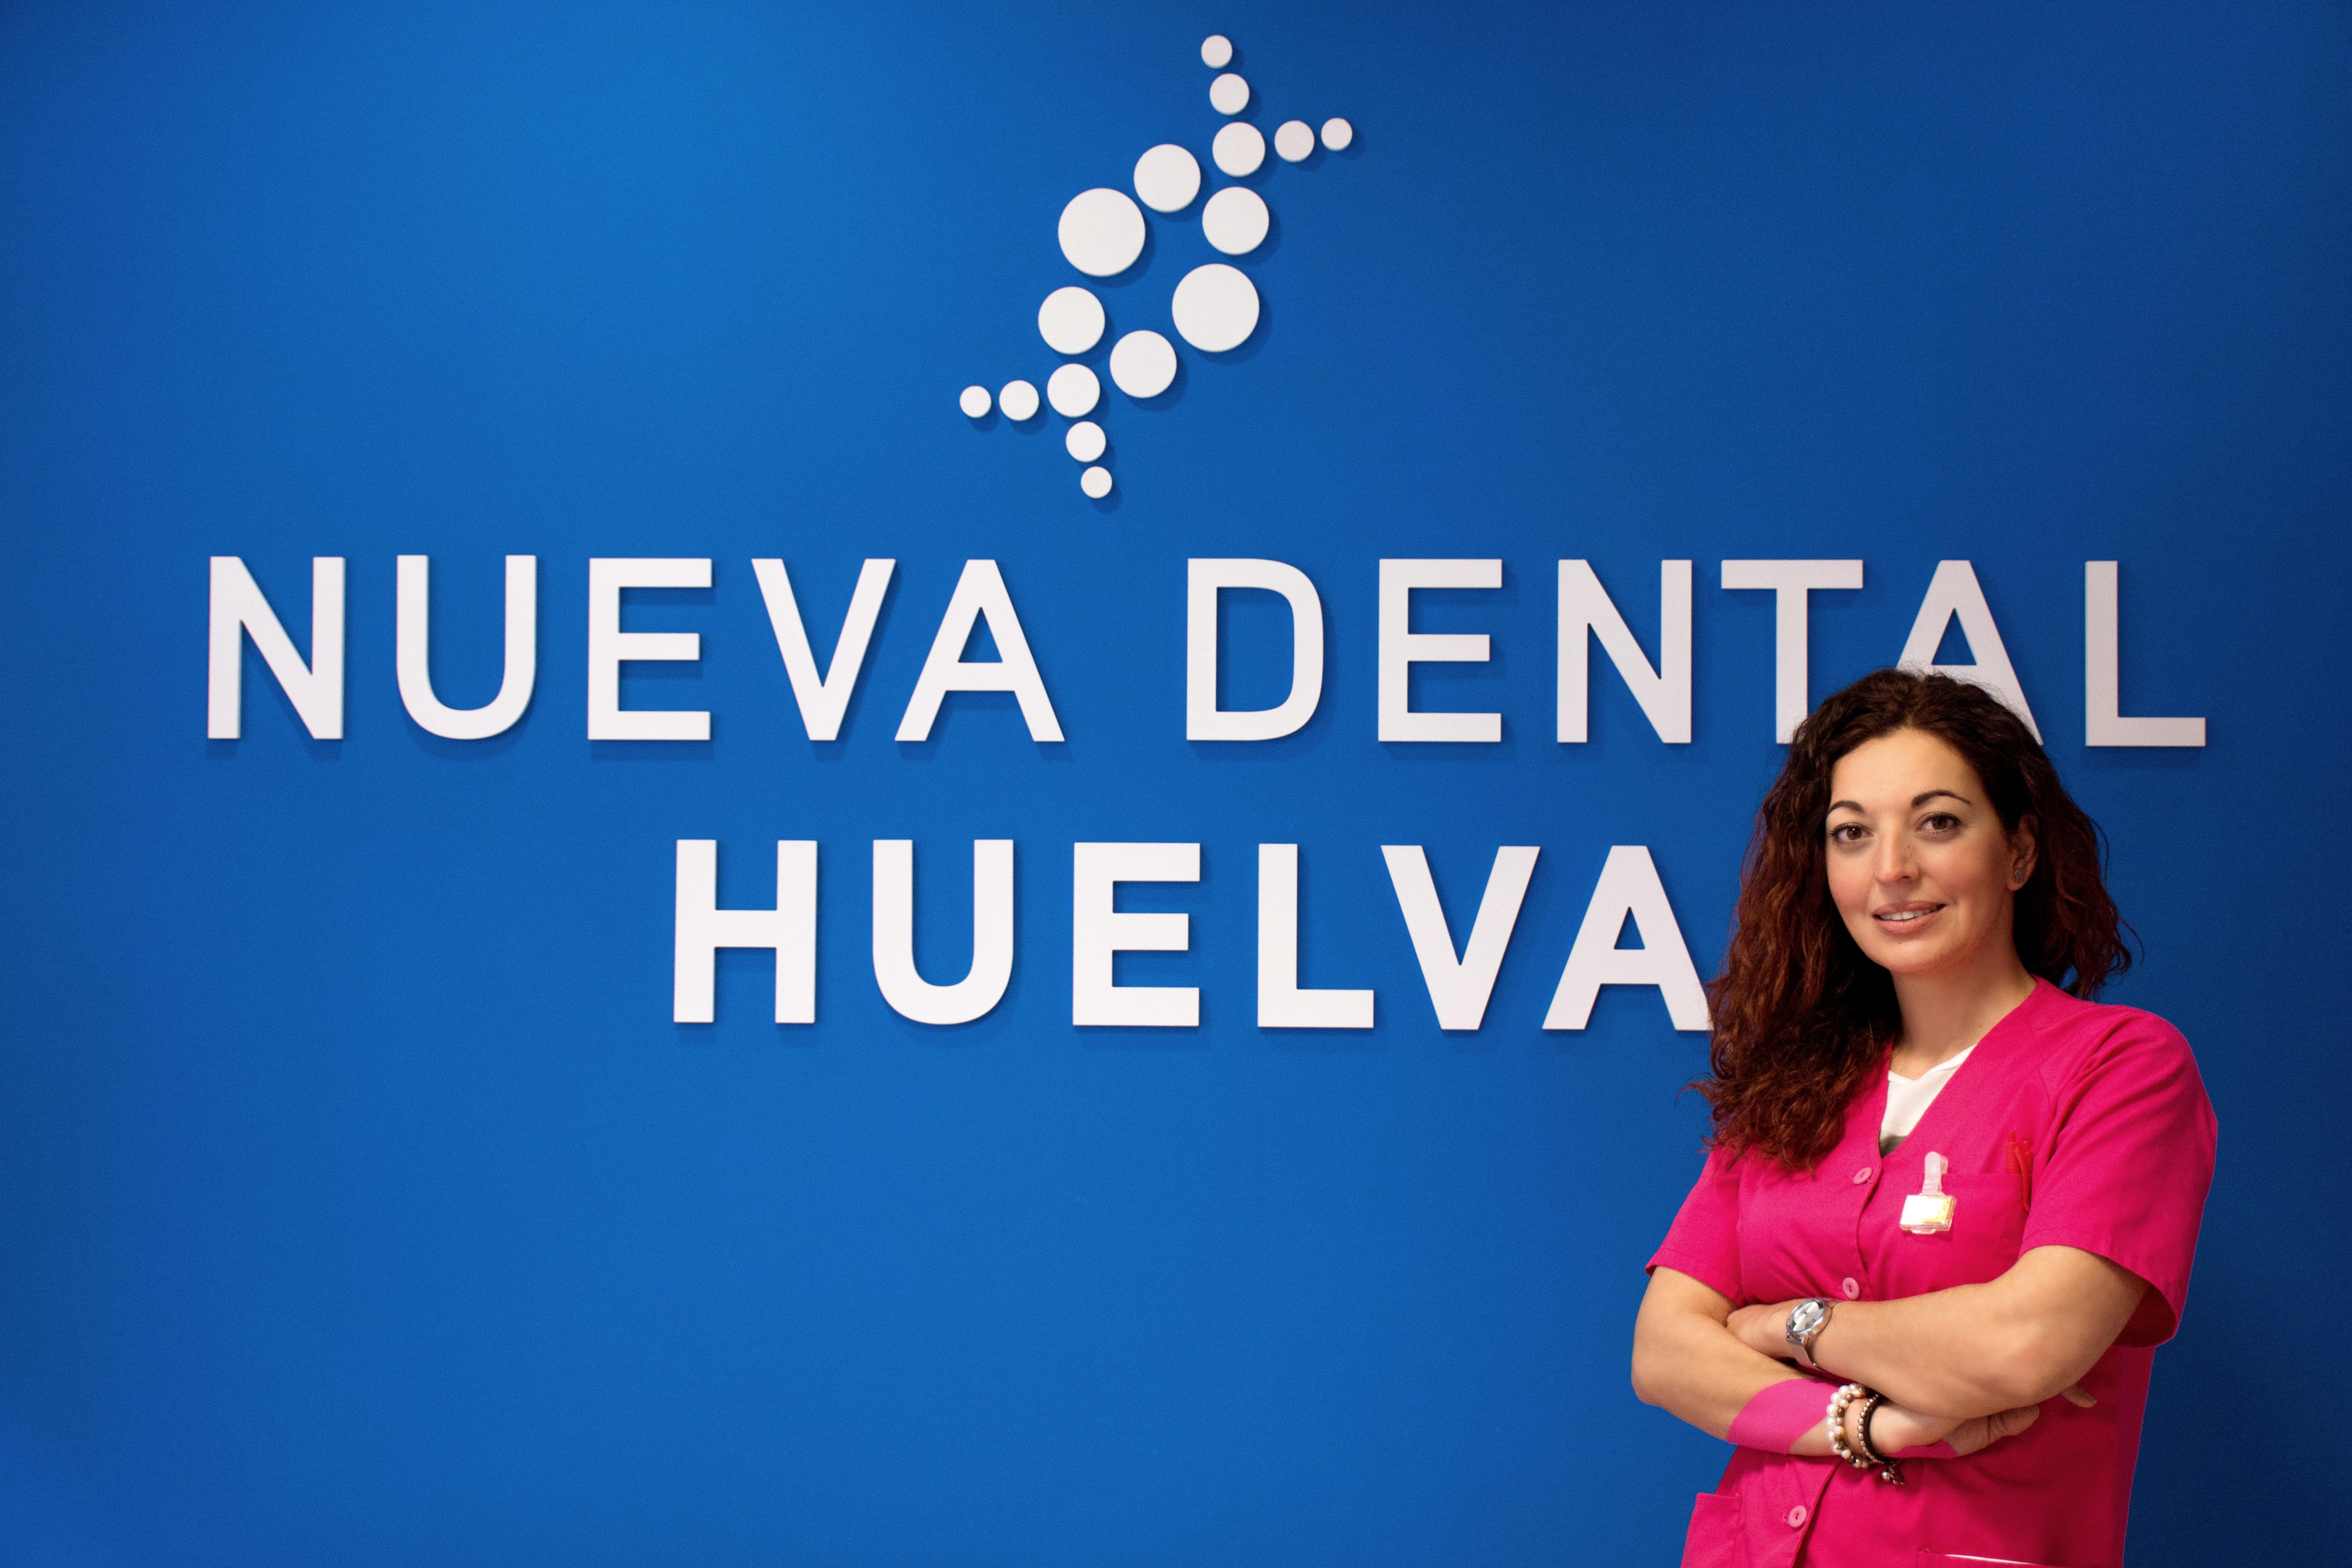 nueva dental huelva clinica